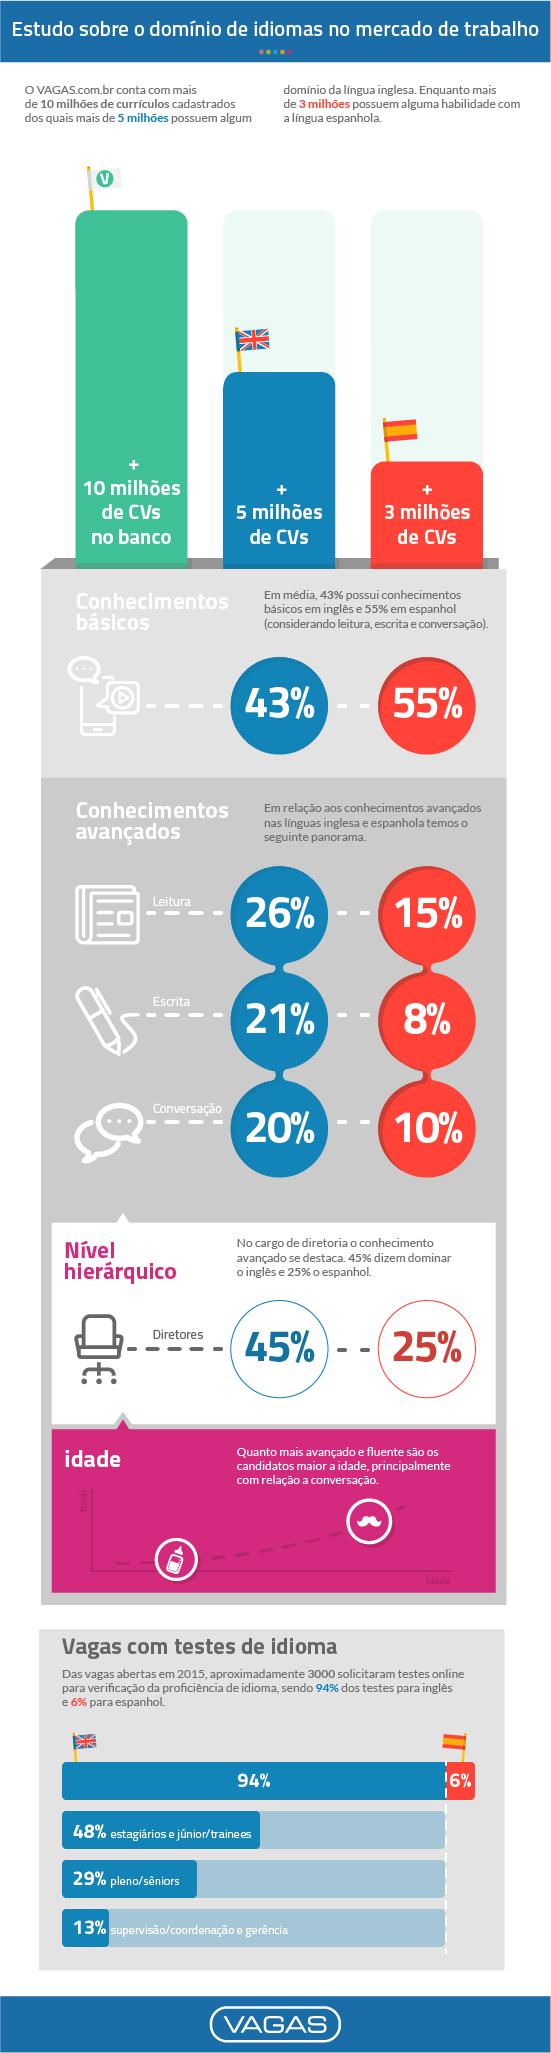 Idiomas: retrato do mercado de trabalho